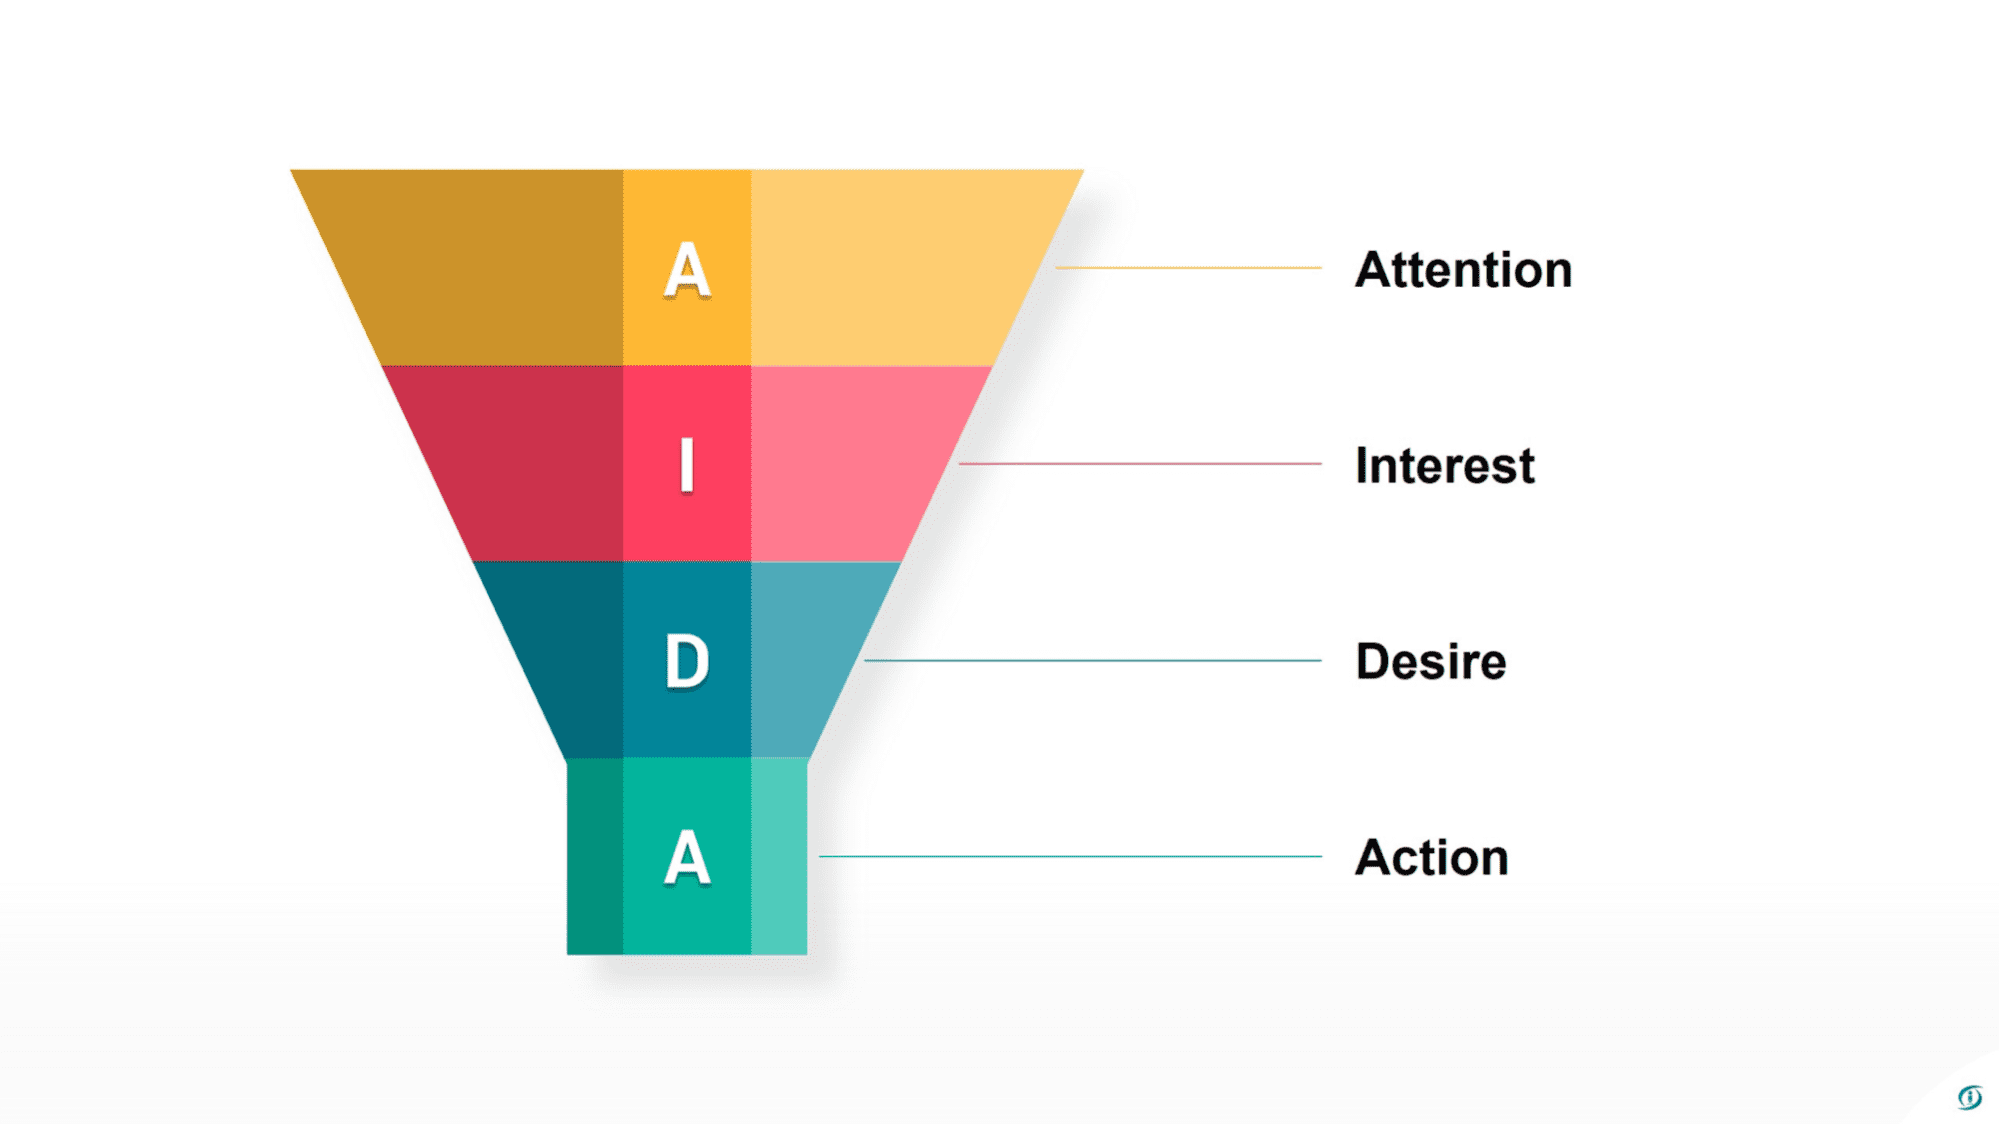 the marketing model called AIDA